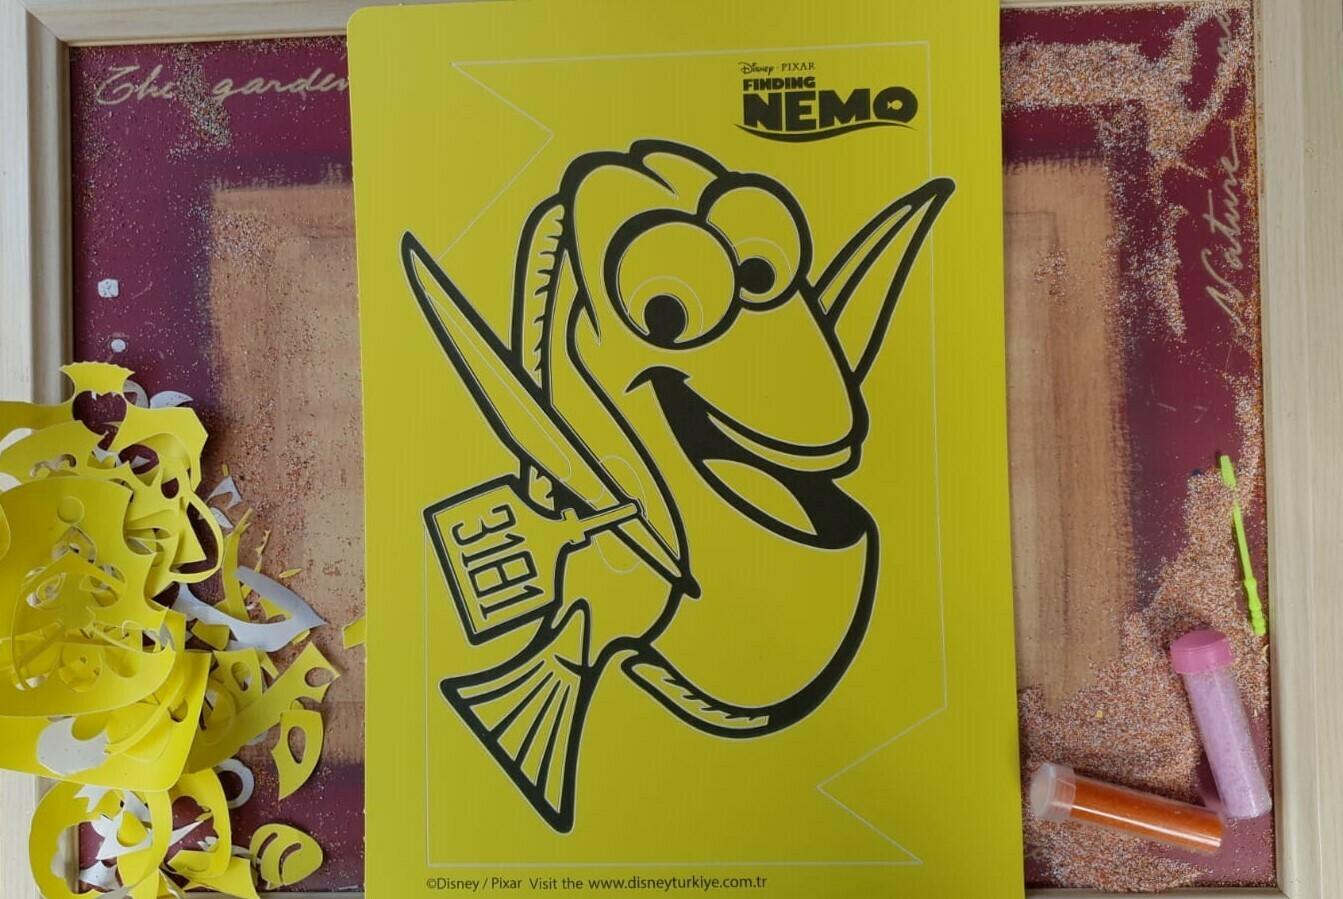 Nemo Sand Art Cards